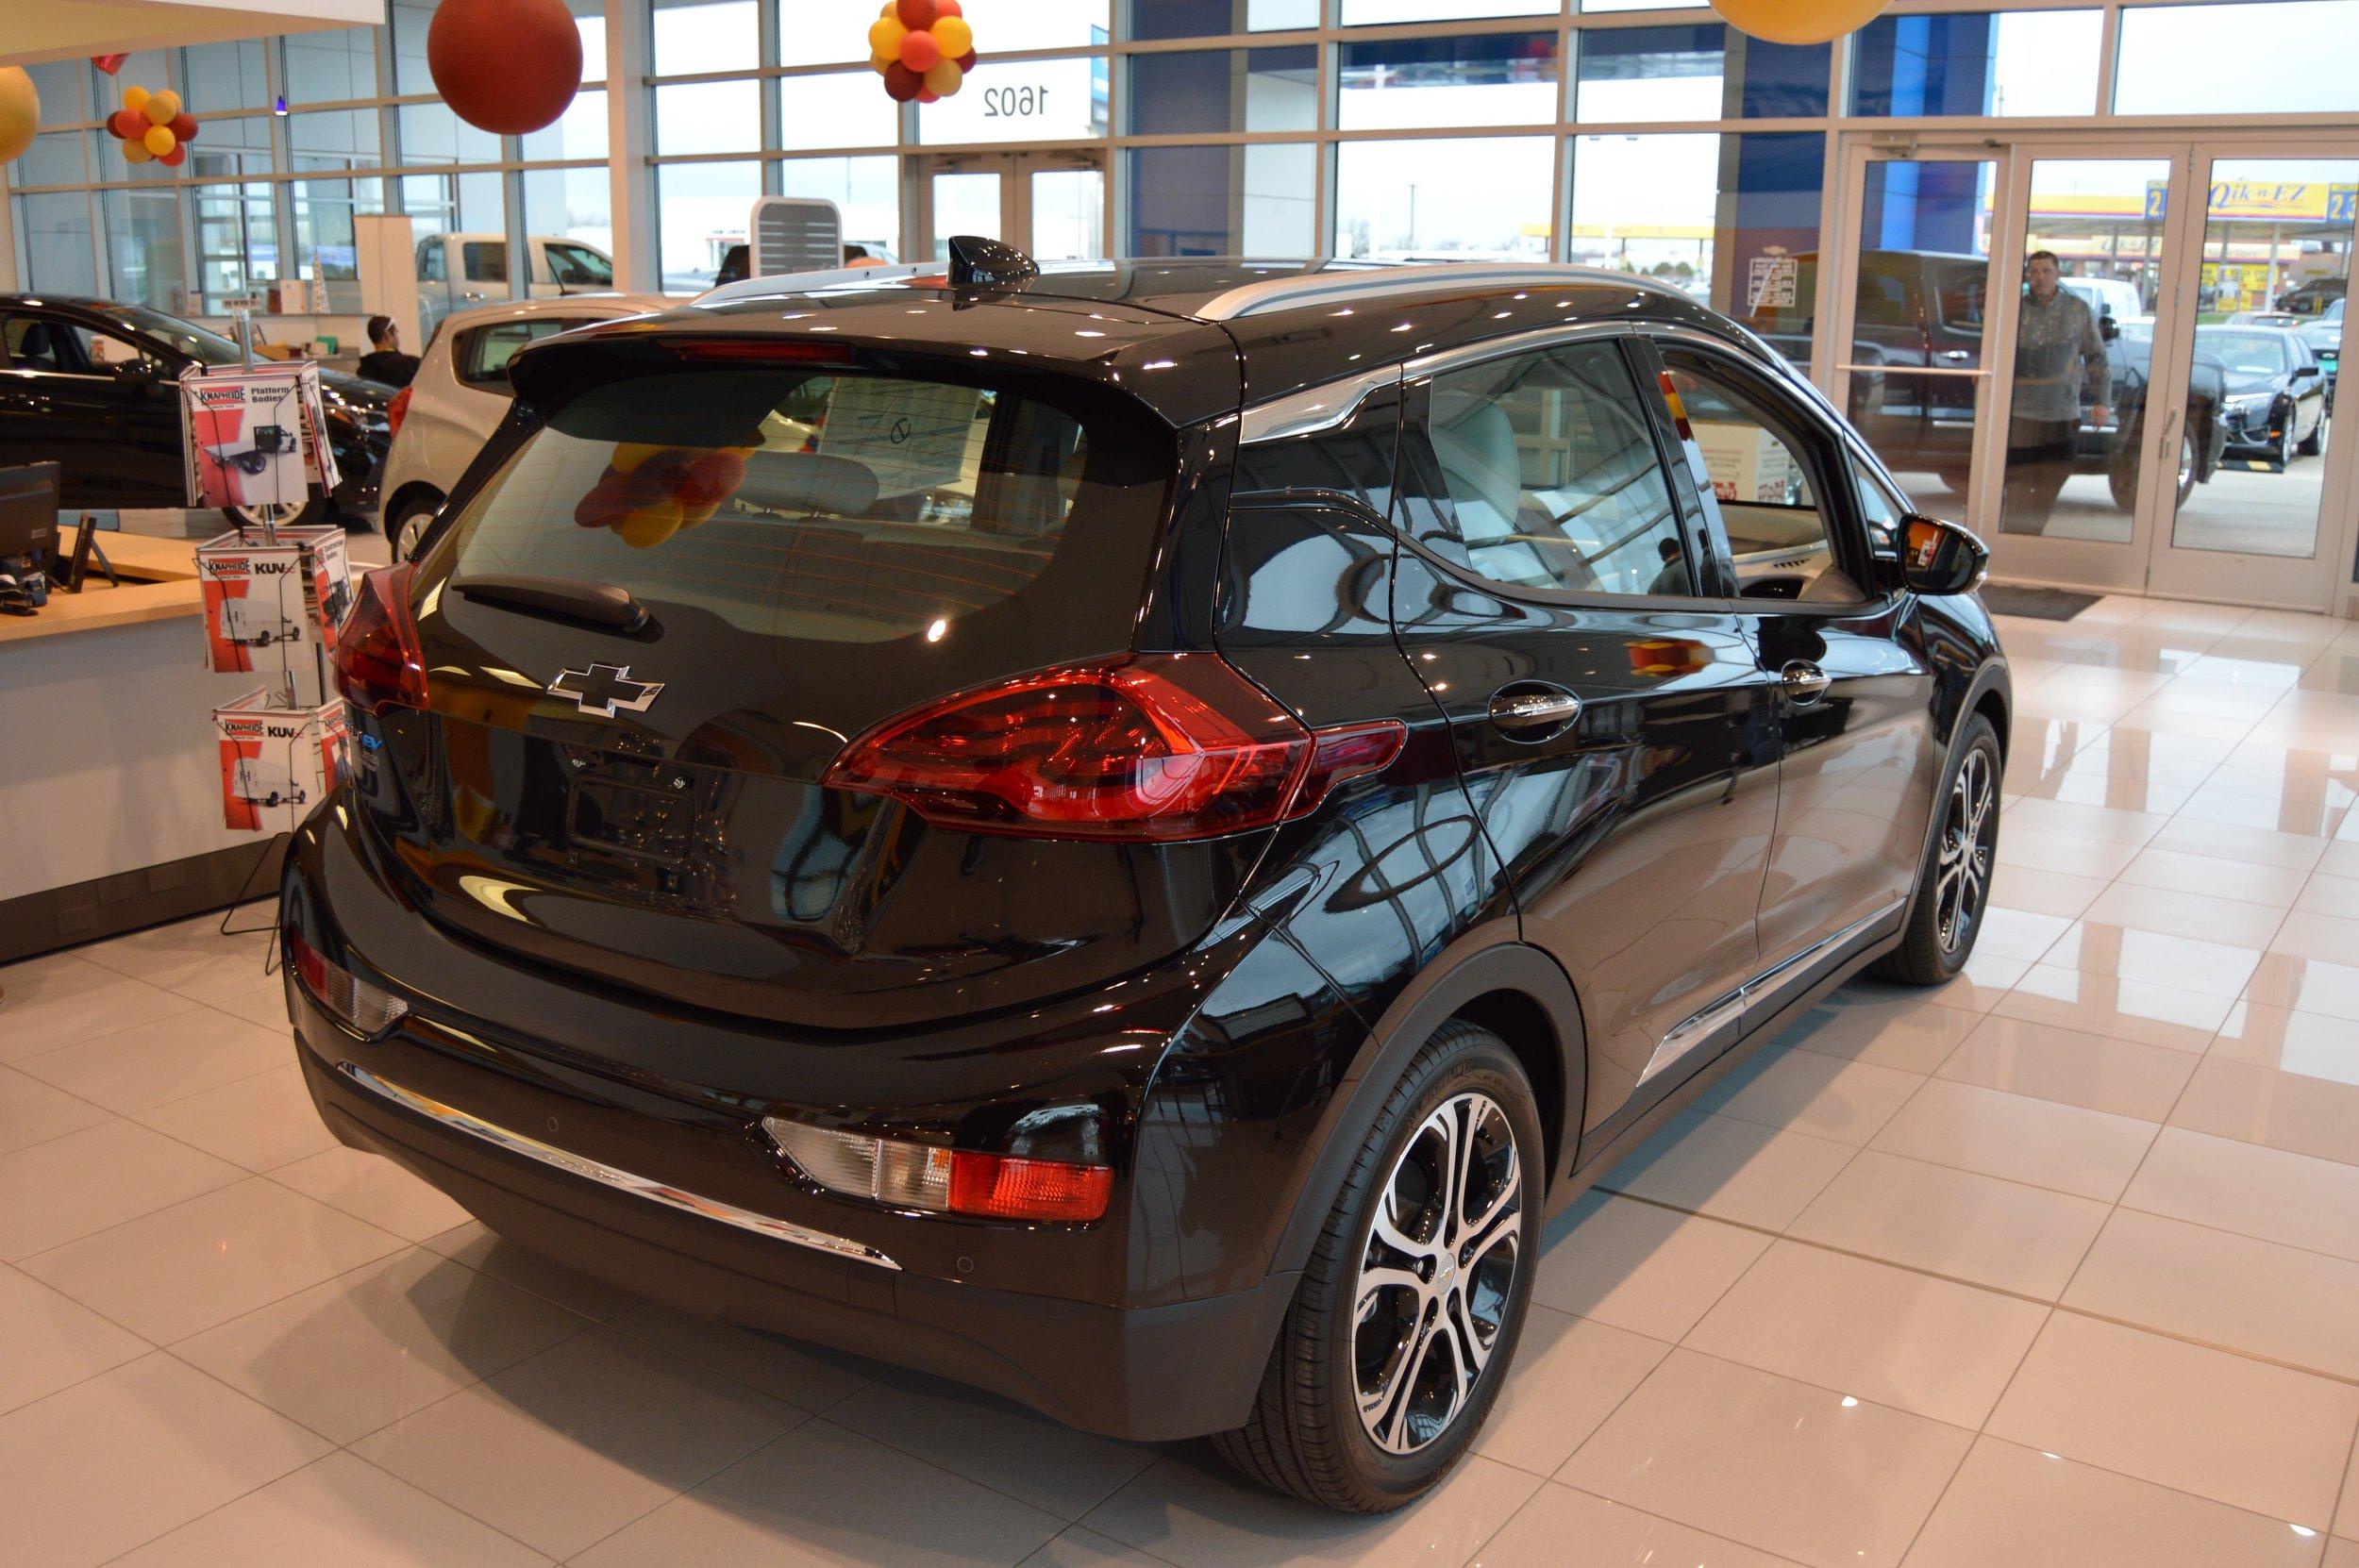 Chevy Bolt EVTown Electric Car.jpg